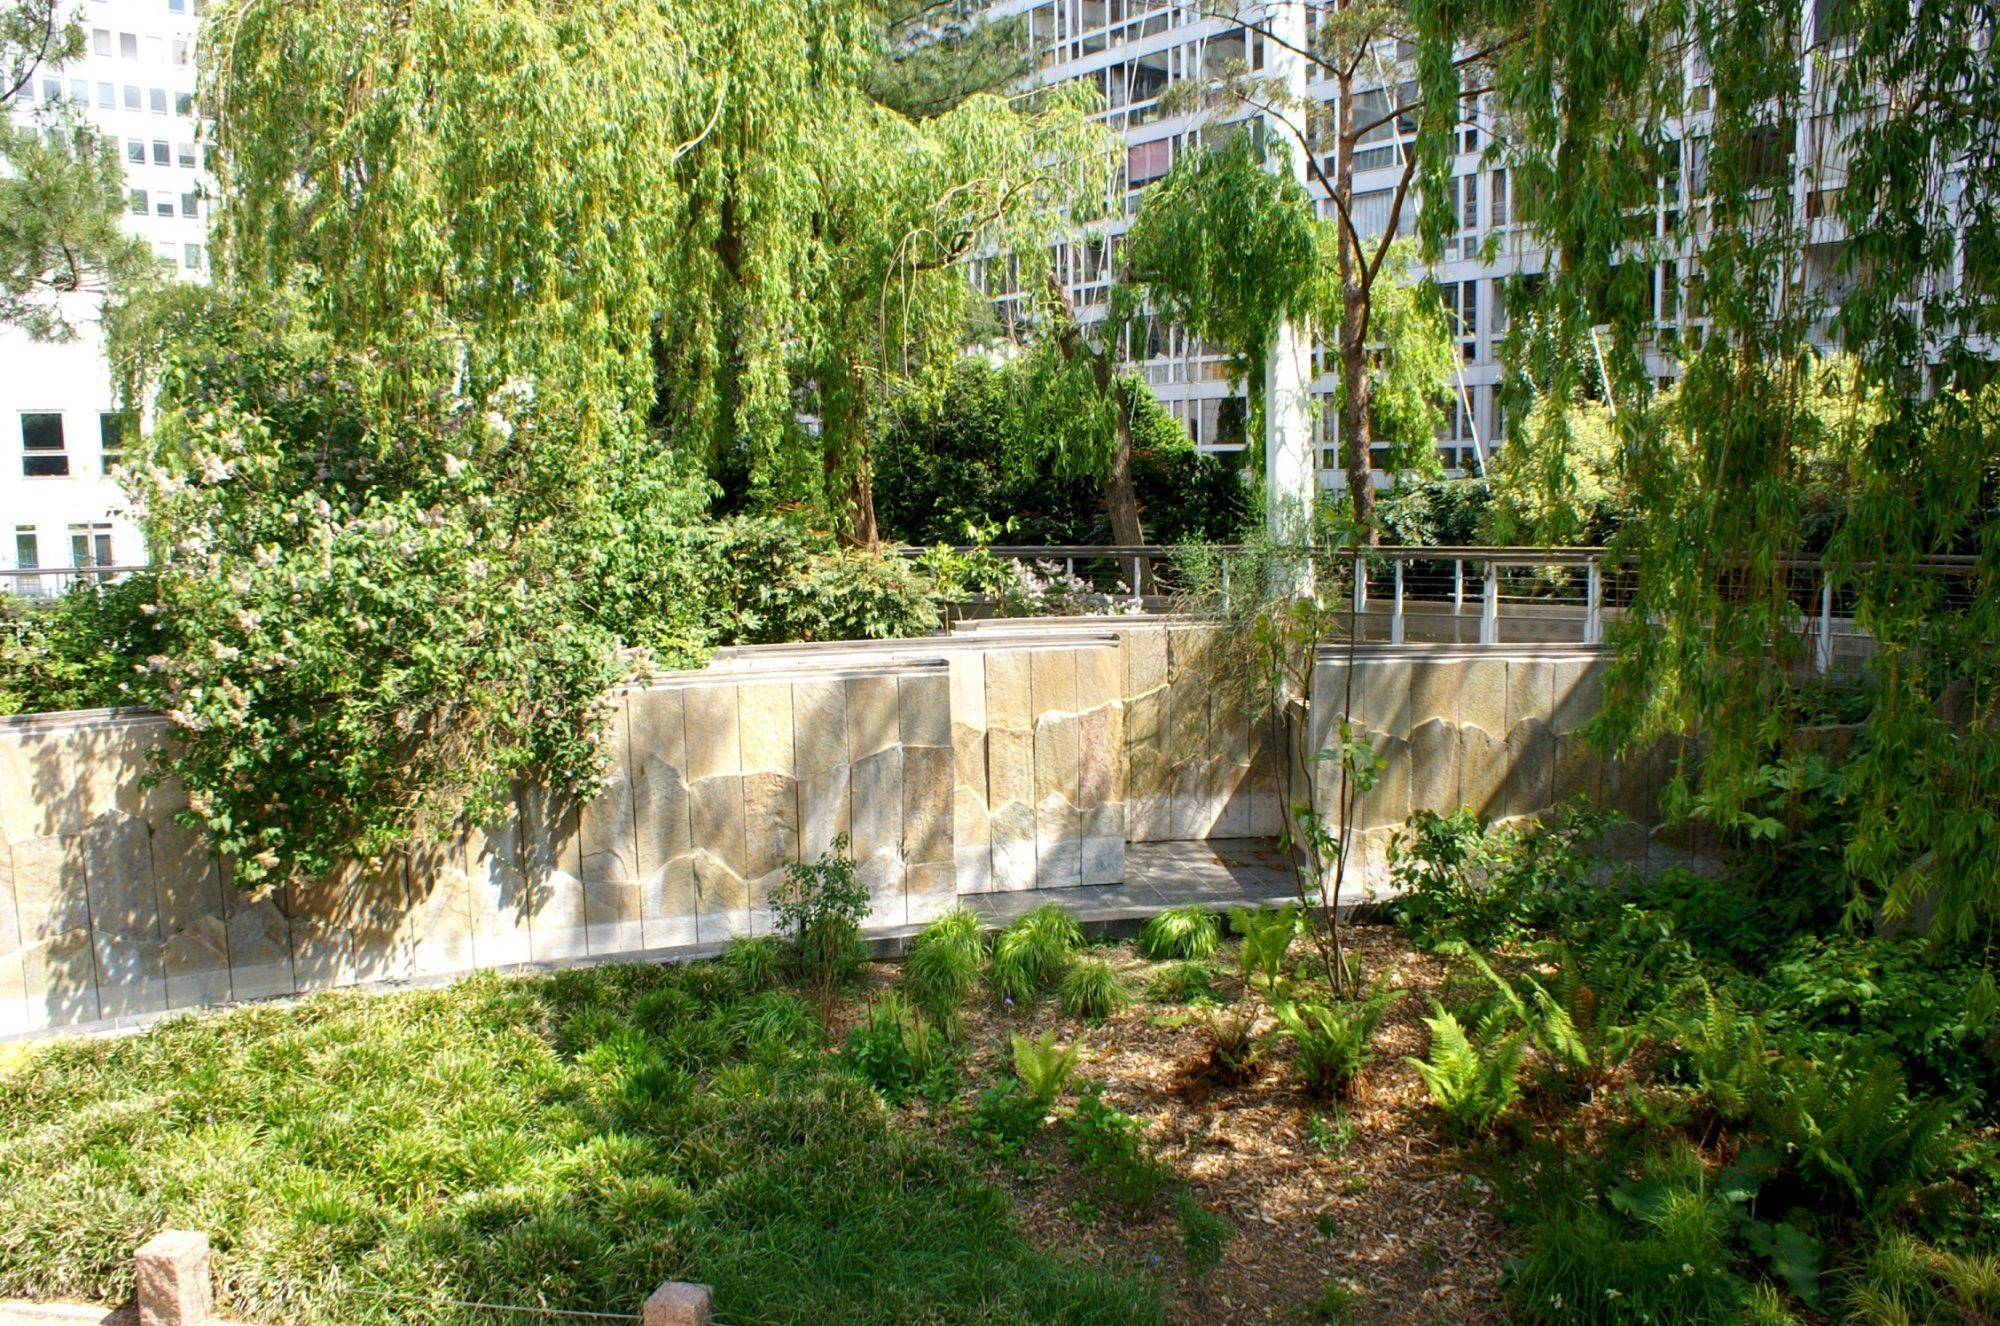 Jardin atlantique paris france top tips before you go for Jardin atlantique